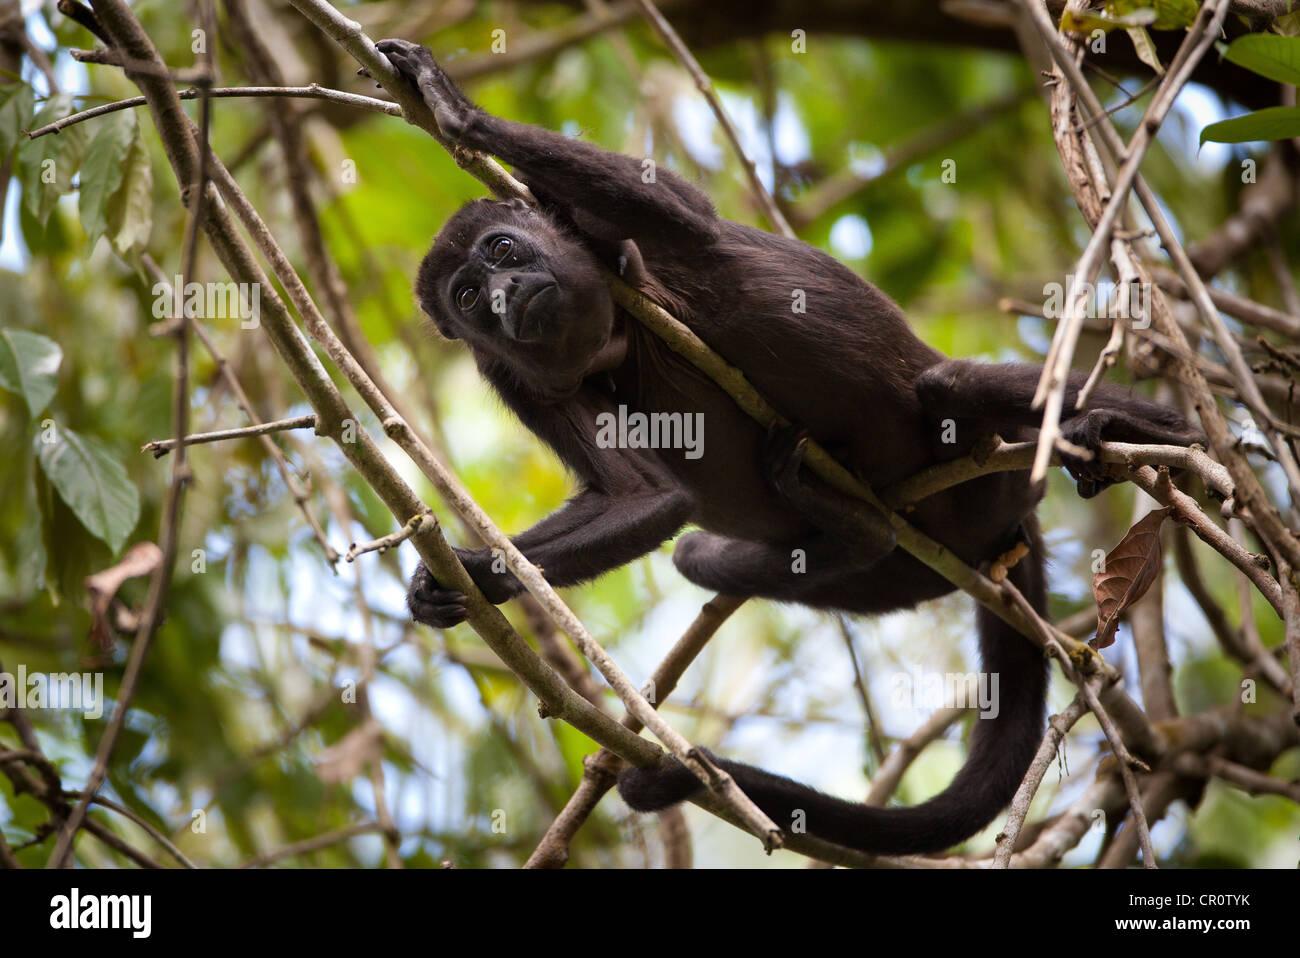 Howler monkey in Soberania national park, Republic of Panama. - Stock Image